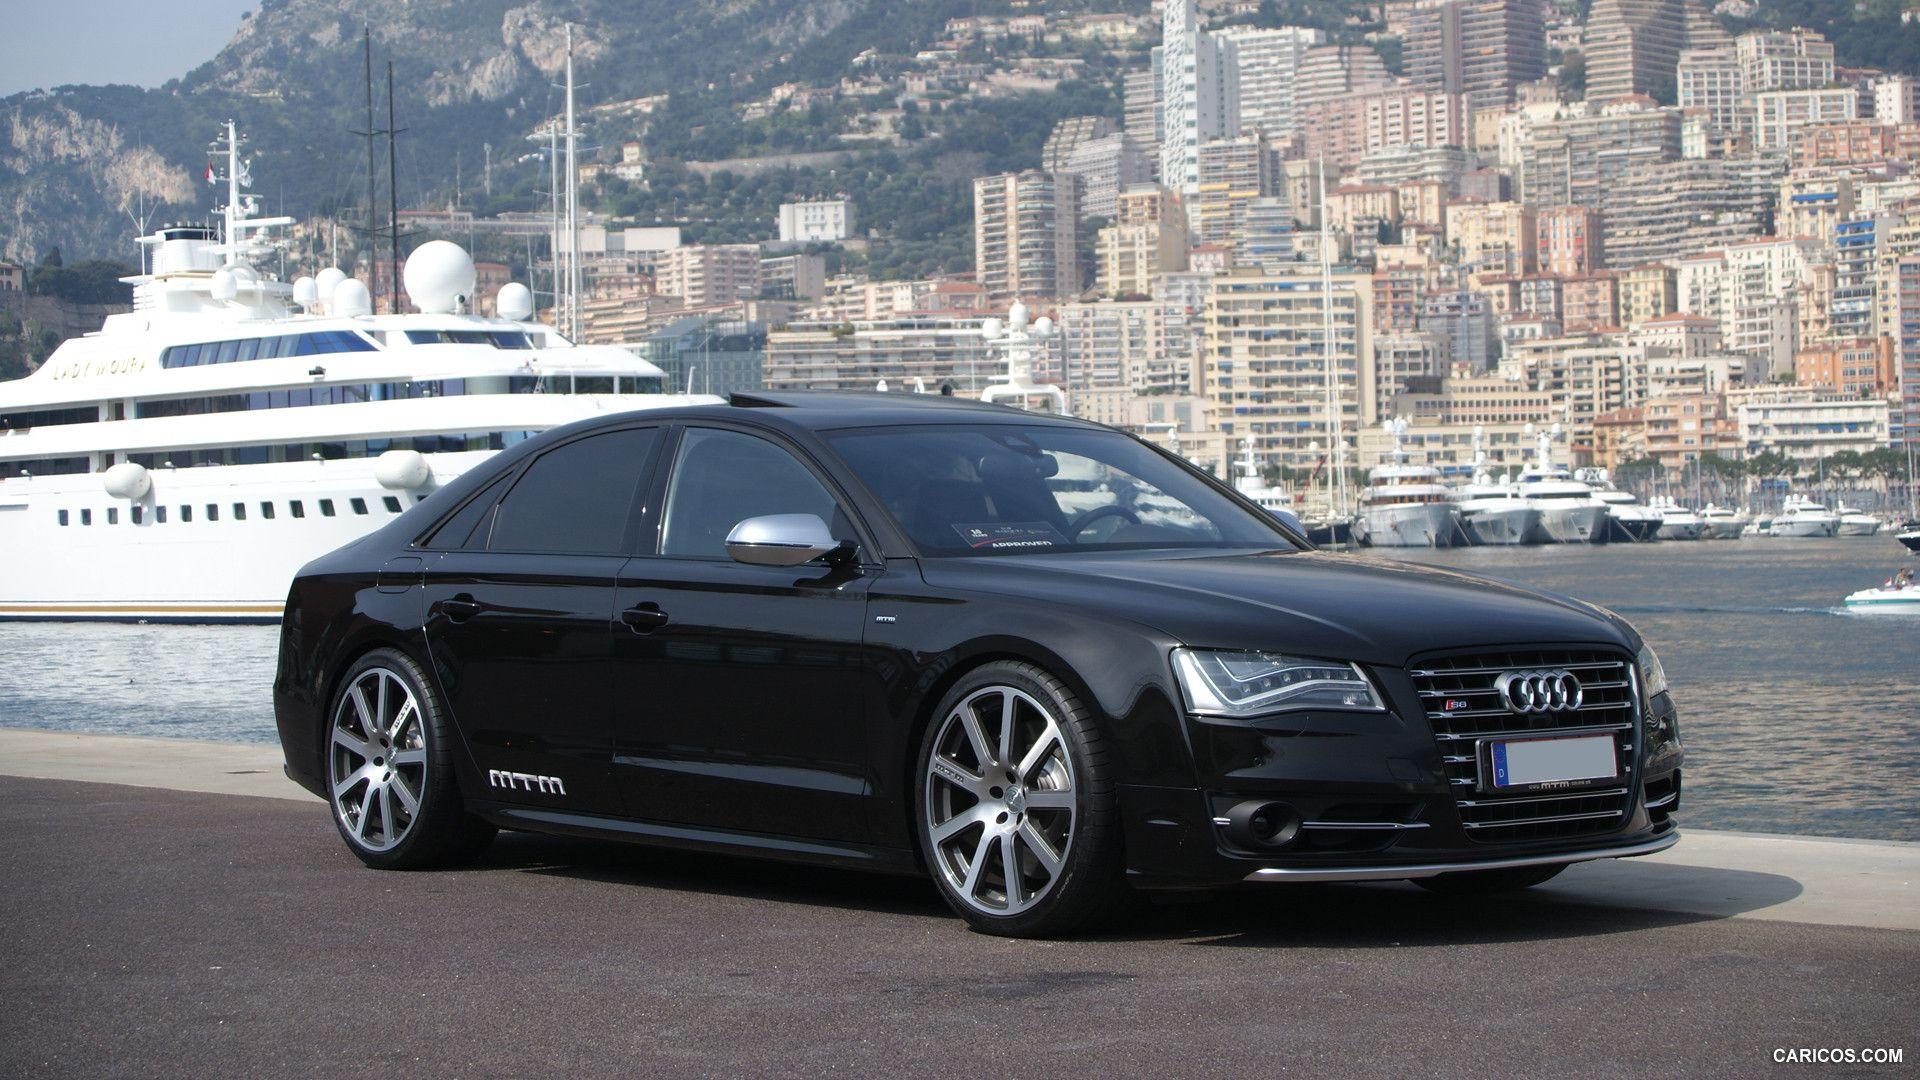 2013 Mtm Audi S8 Audi Audi Cars Audi A8